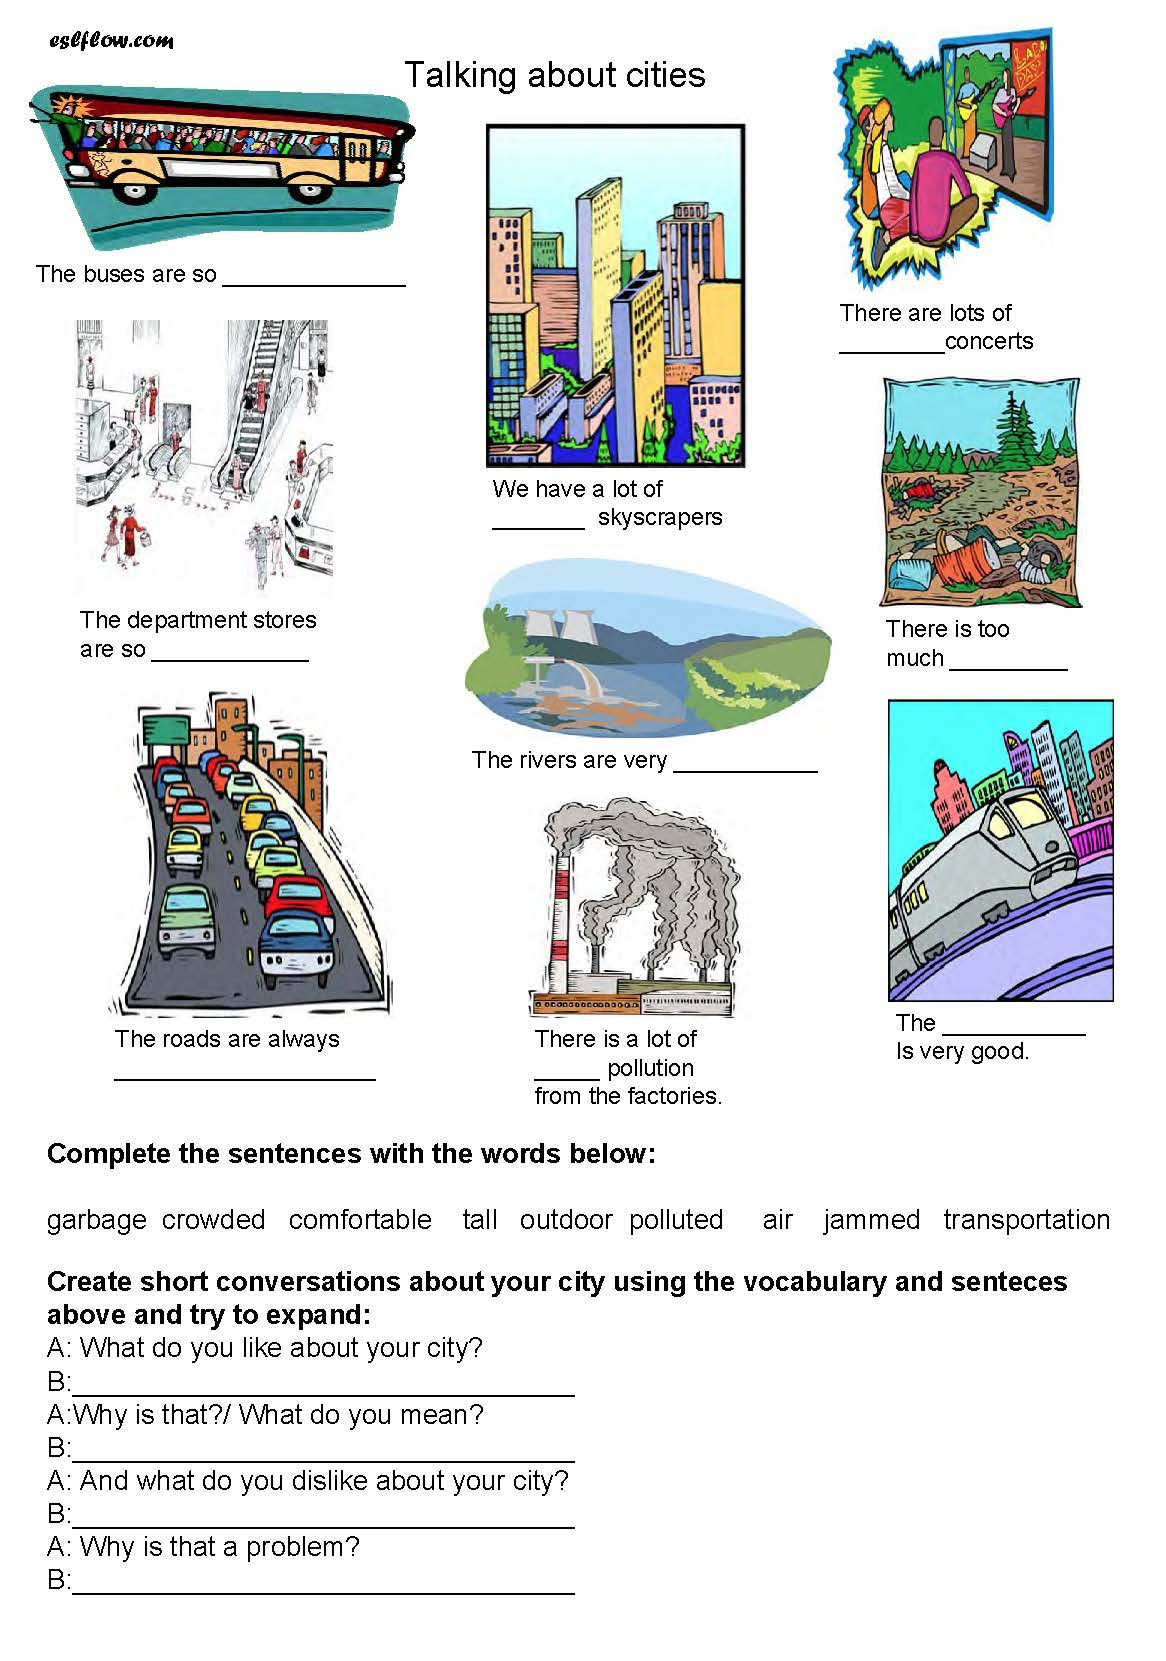 Worksheet About Neighborhoods